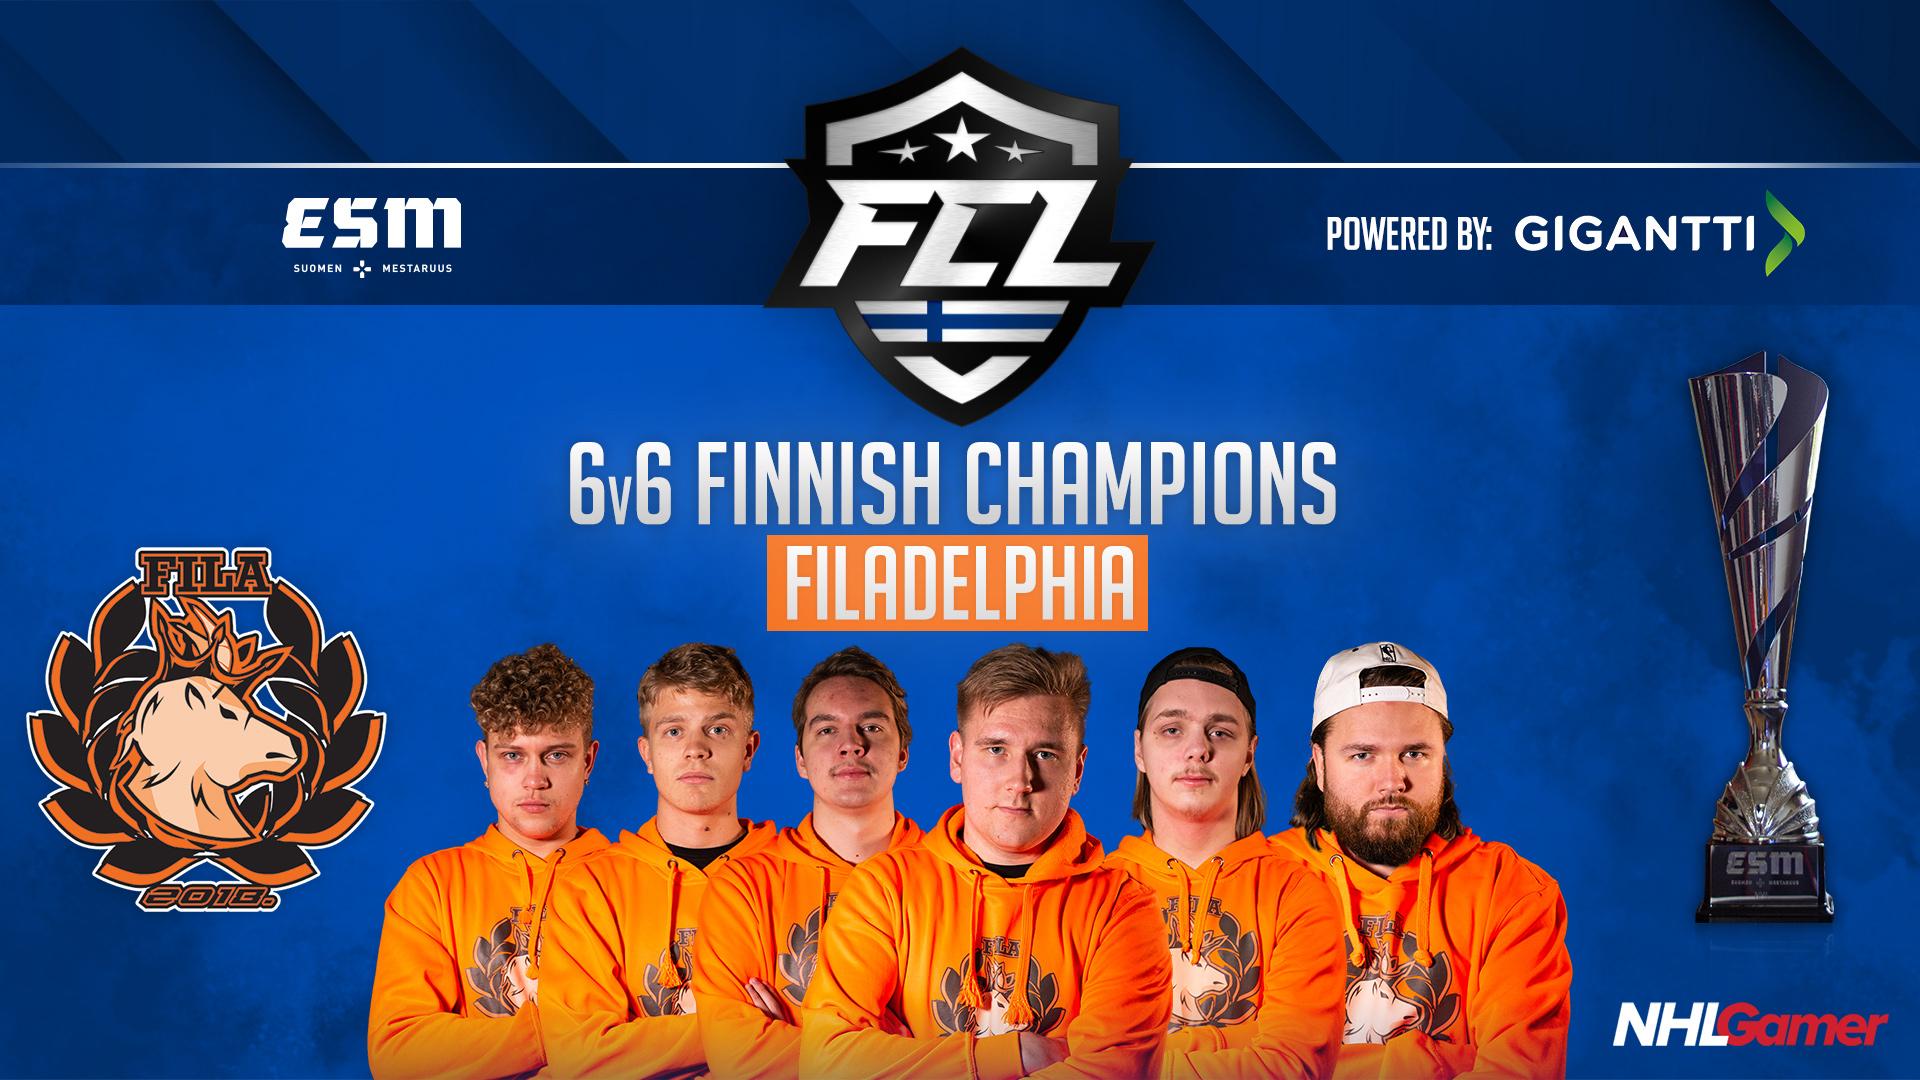 Filadelphia_Finnish_Champions_6v6_2020.j